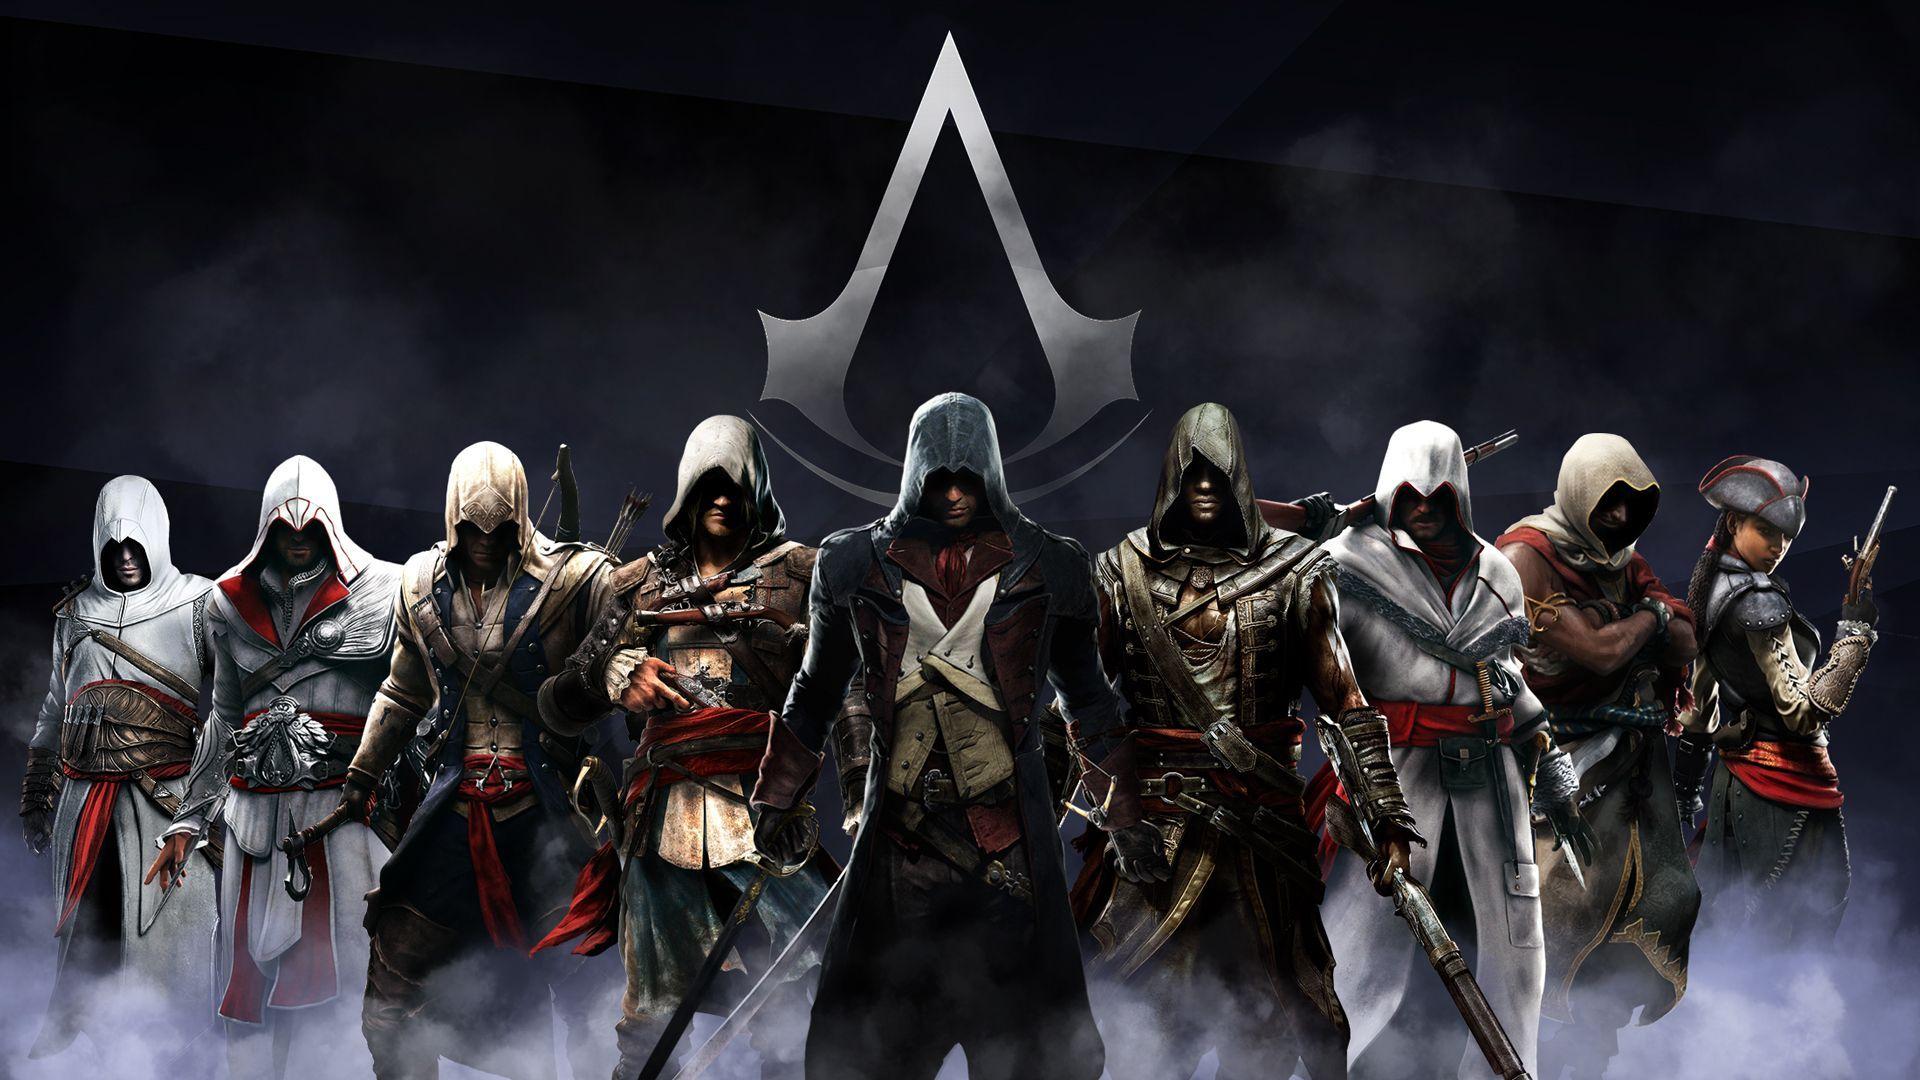 16 Assassin Creed Backgrounds Hq Kian Broscombe